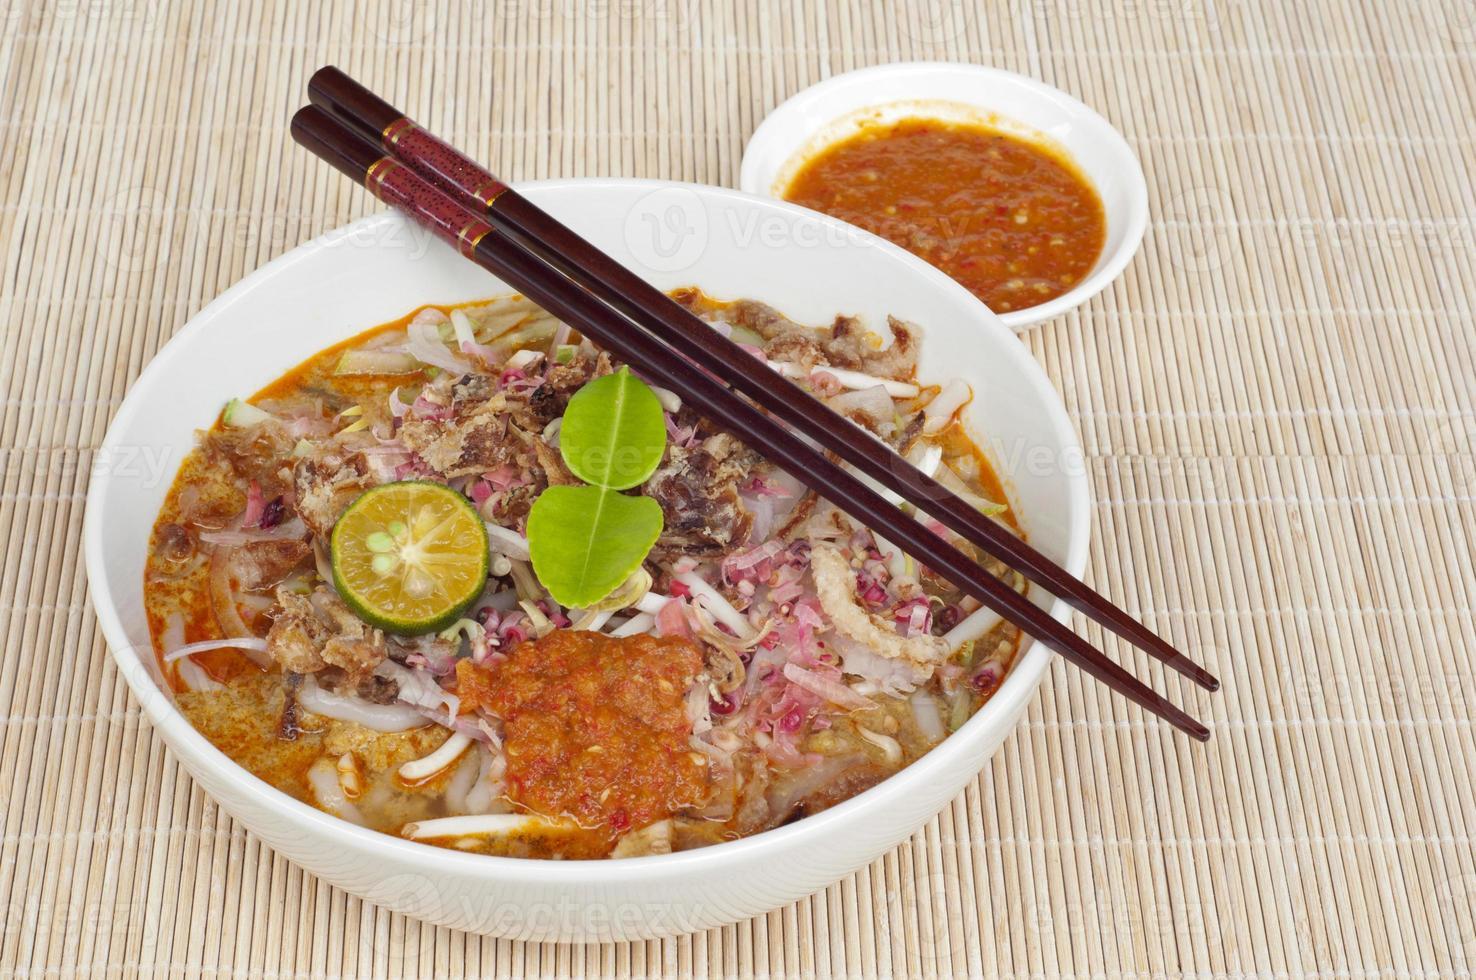 cucina asiatica: johor laksa foto